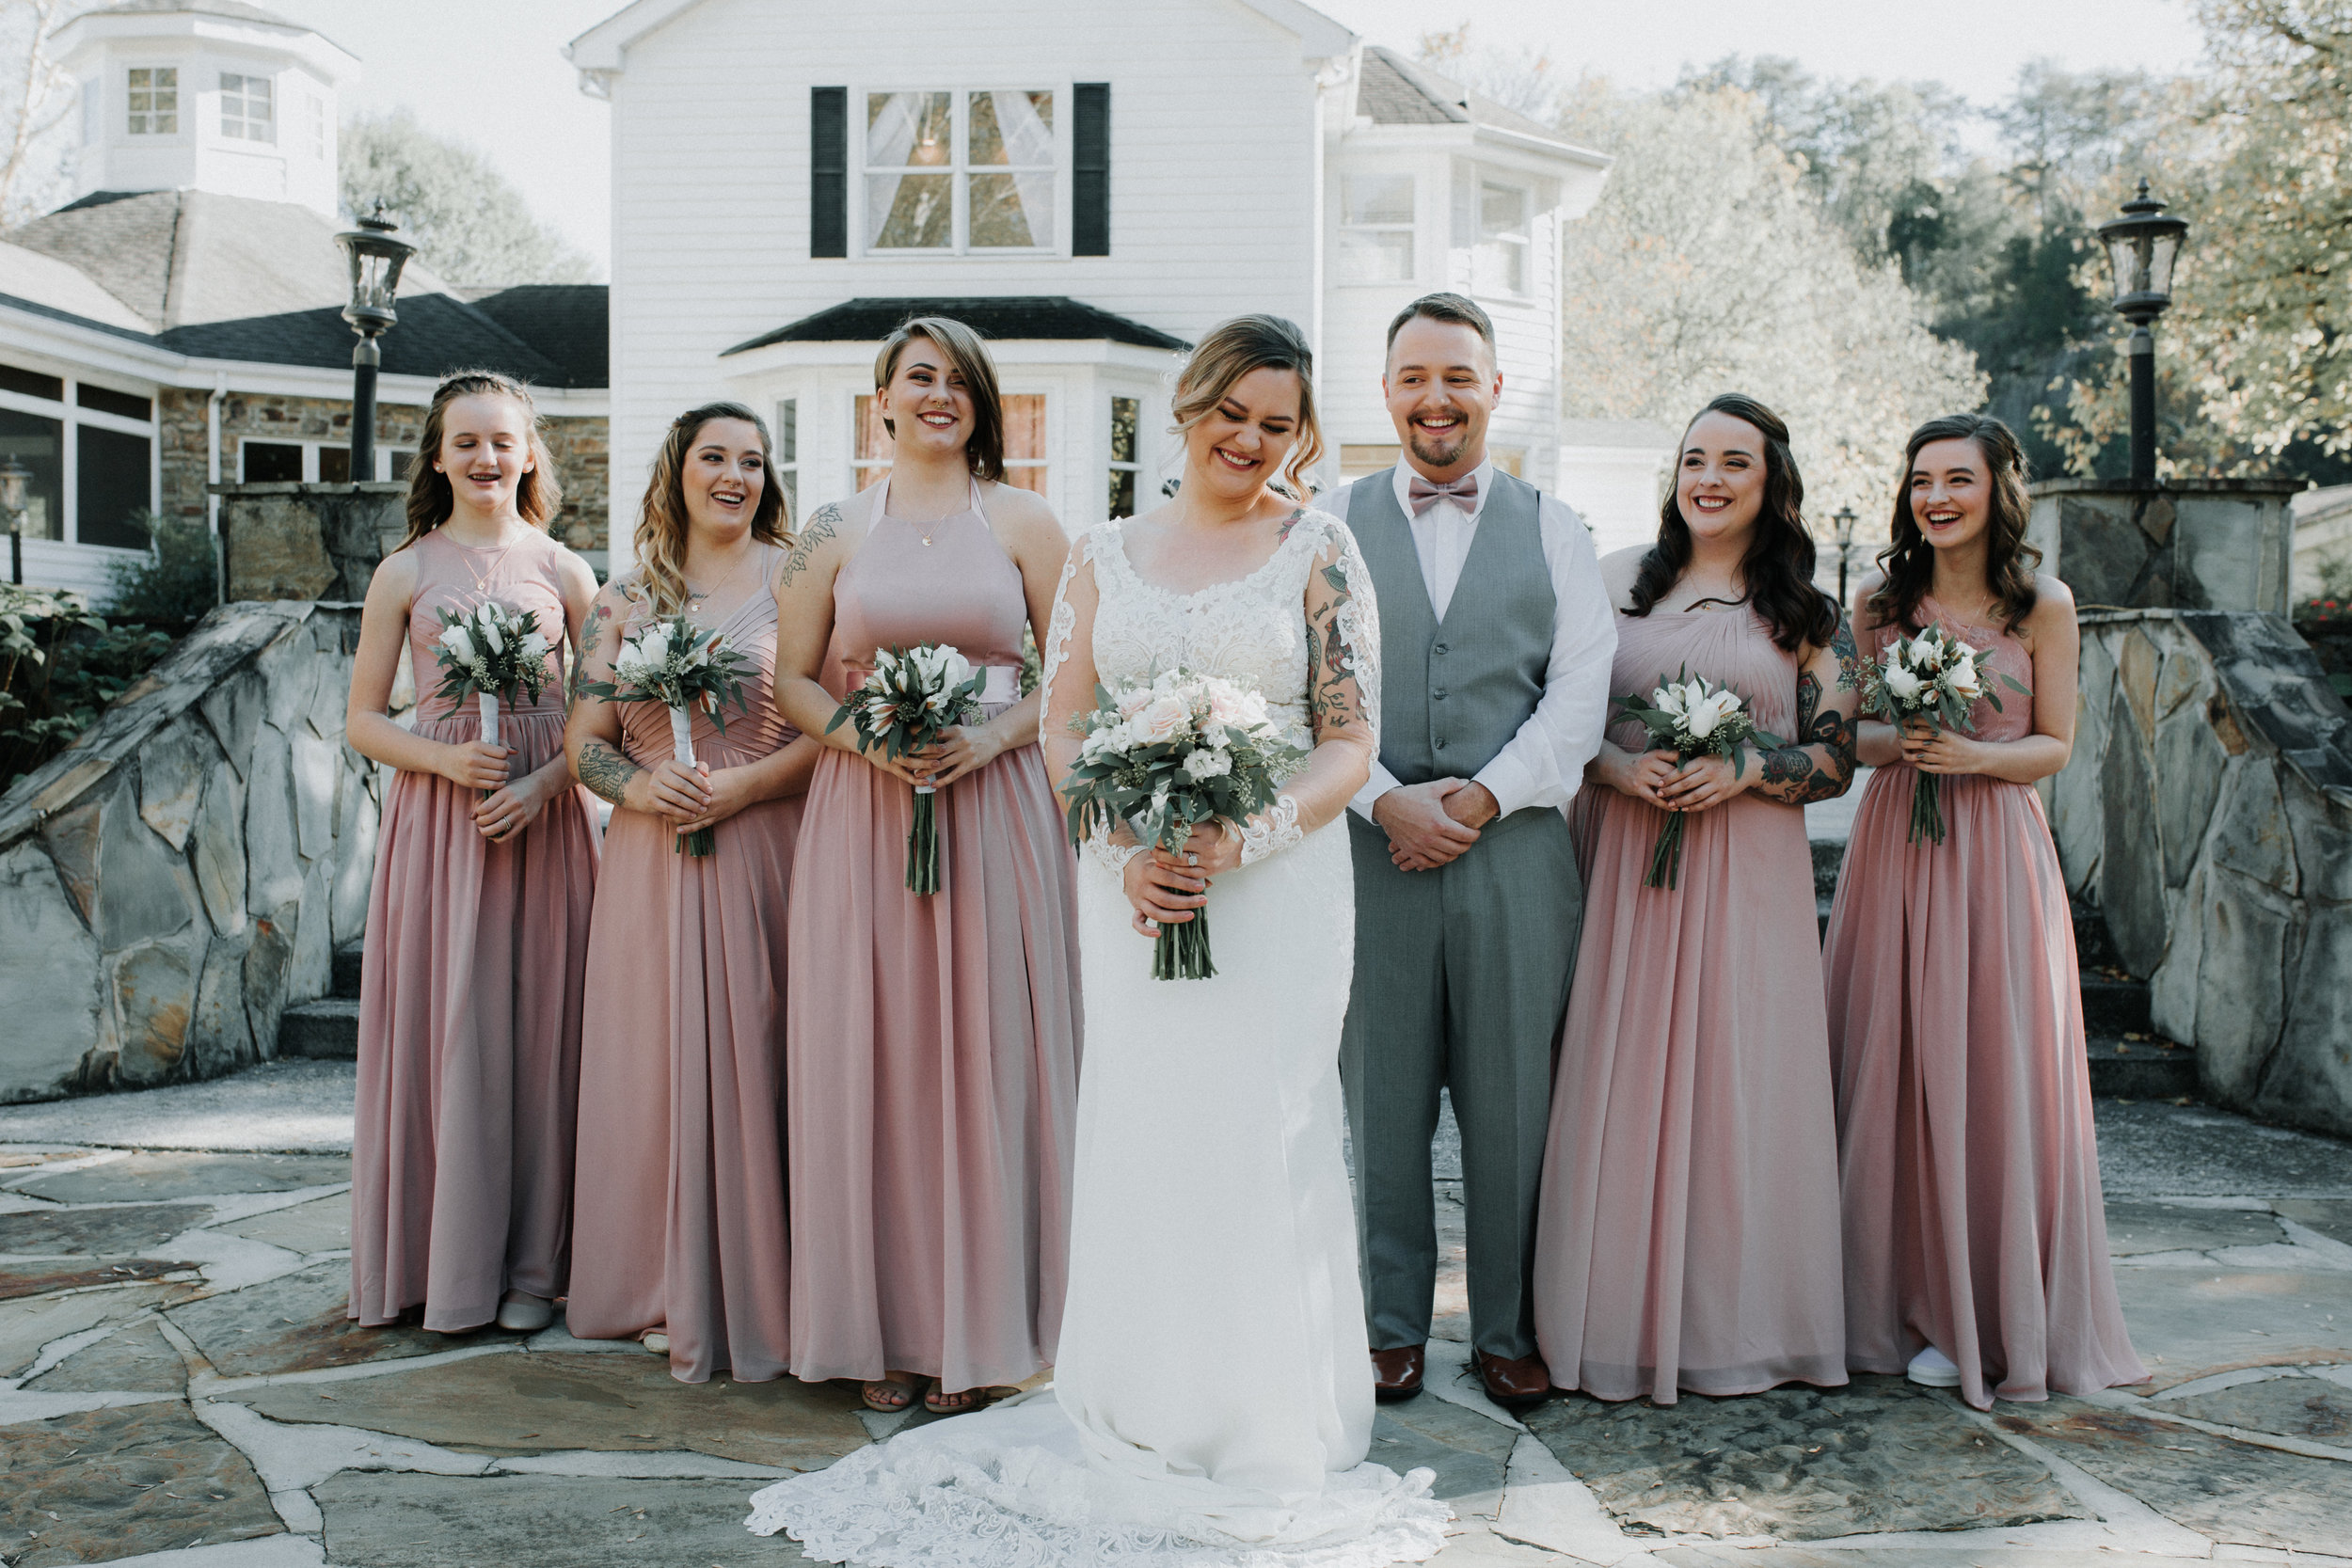 Blush Bridesmaid Dresses - Dara's Garden Knoxville East Tennessee Wedding — The Overwhelmed Bride Wedding Blog